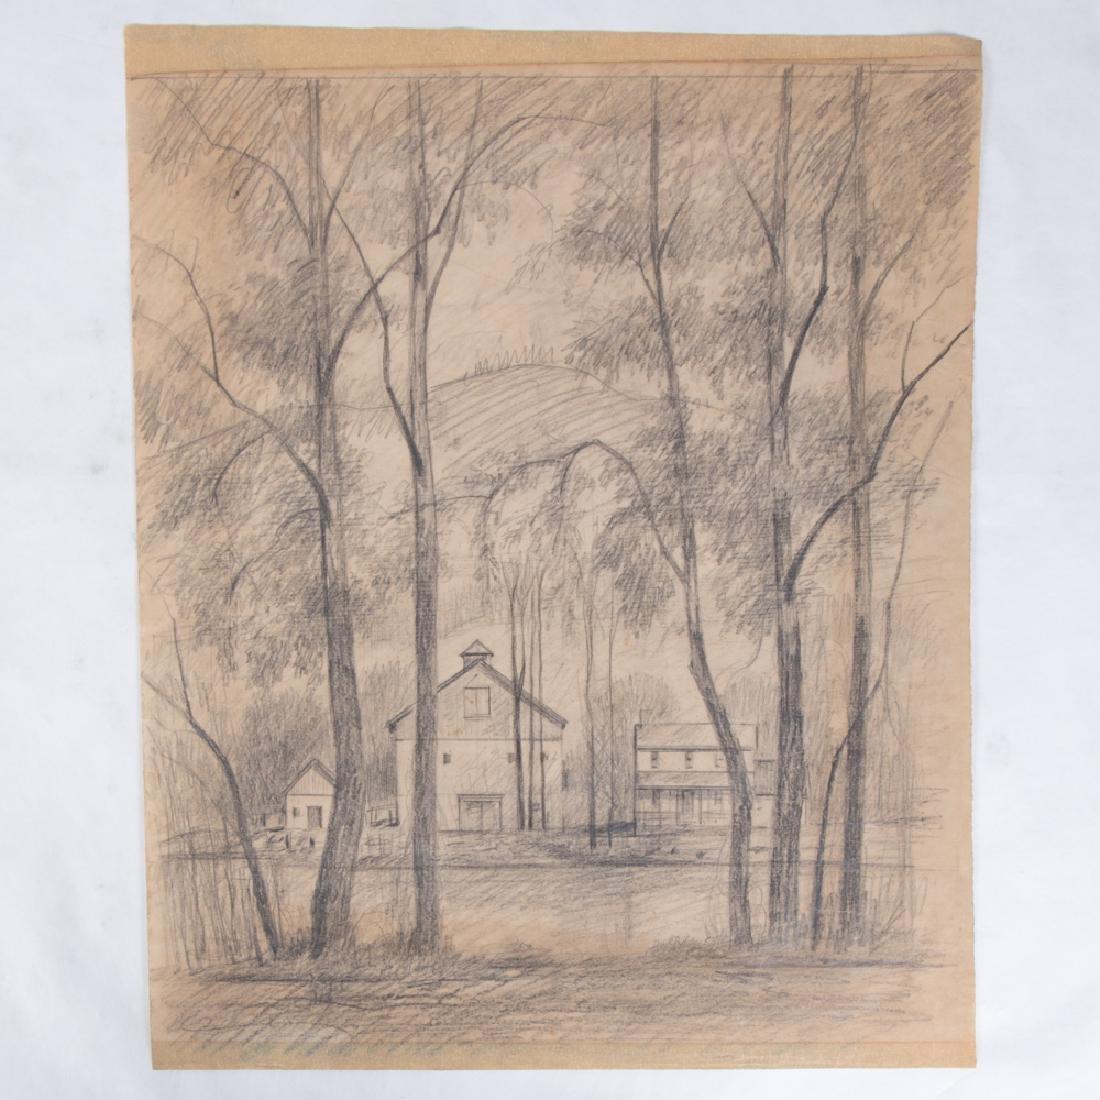 Paul Riba (1912-1977) Two Landscape Studies, Pencil on - 4